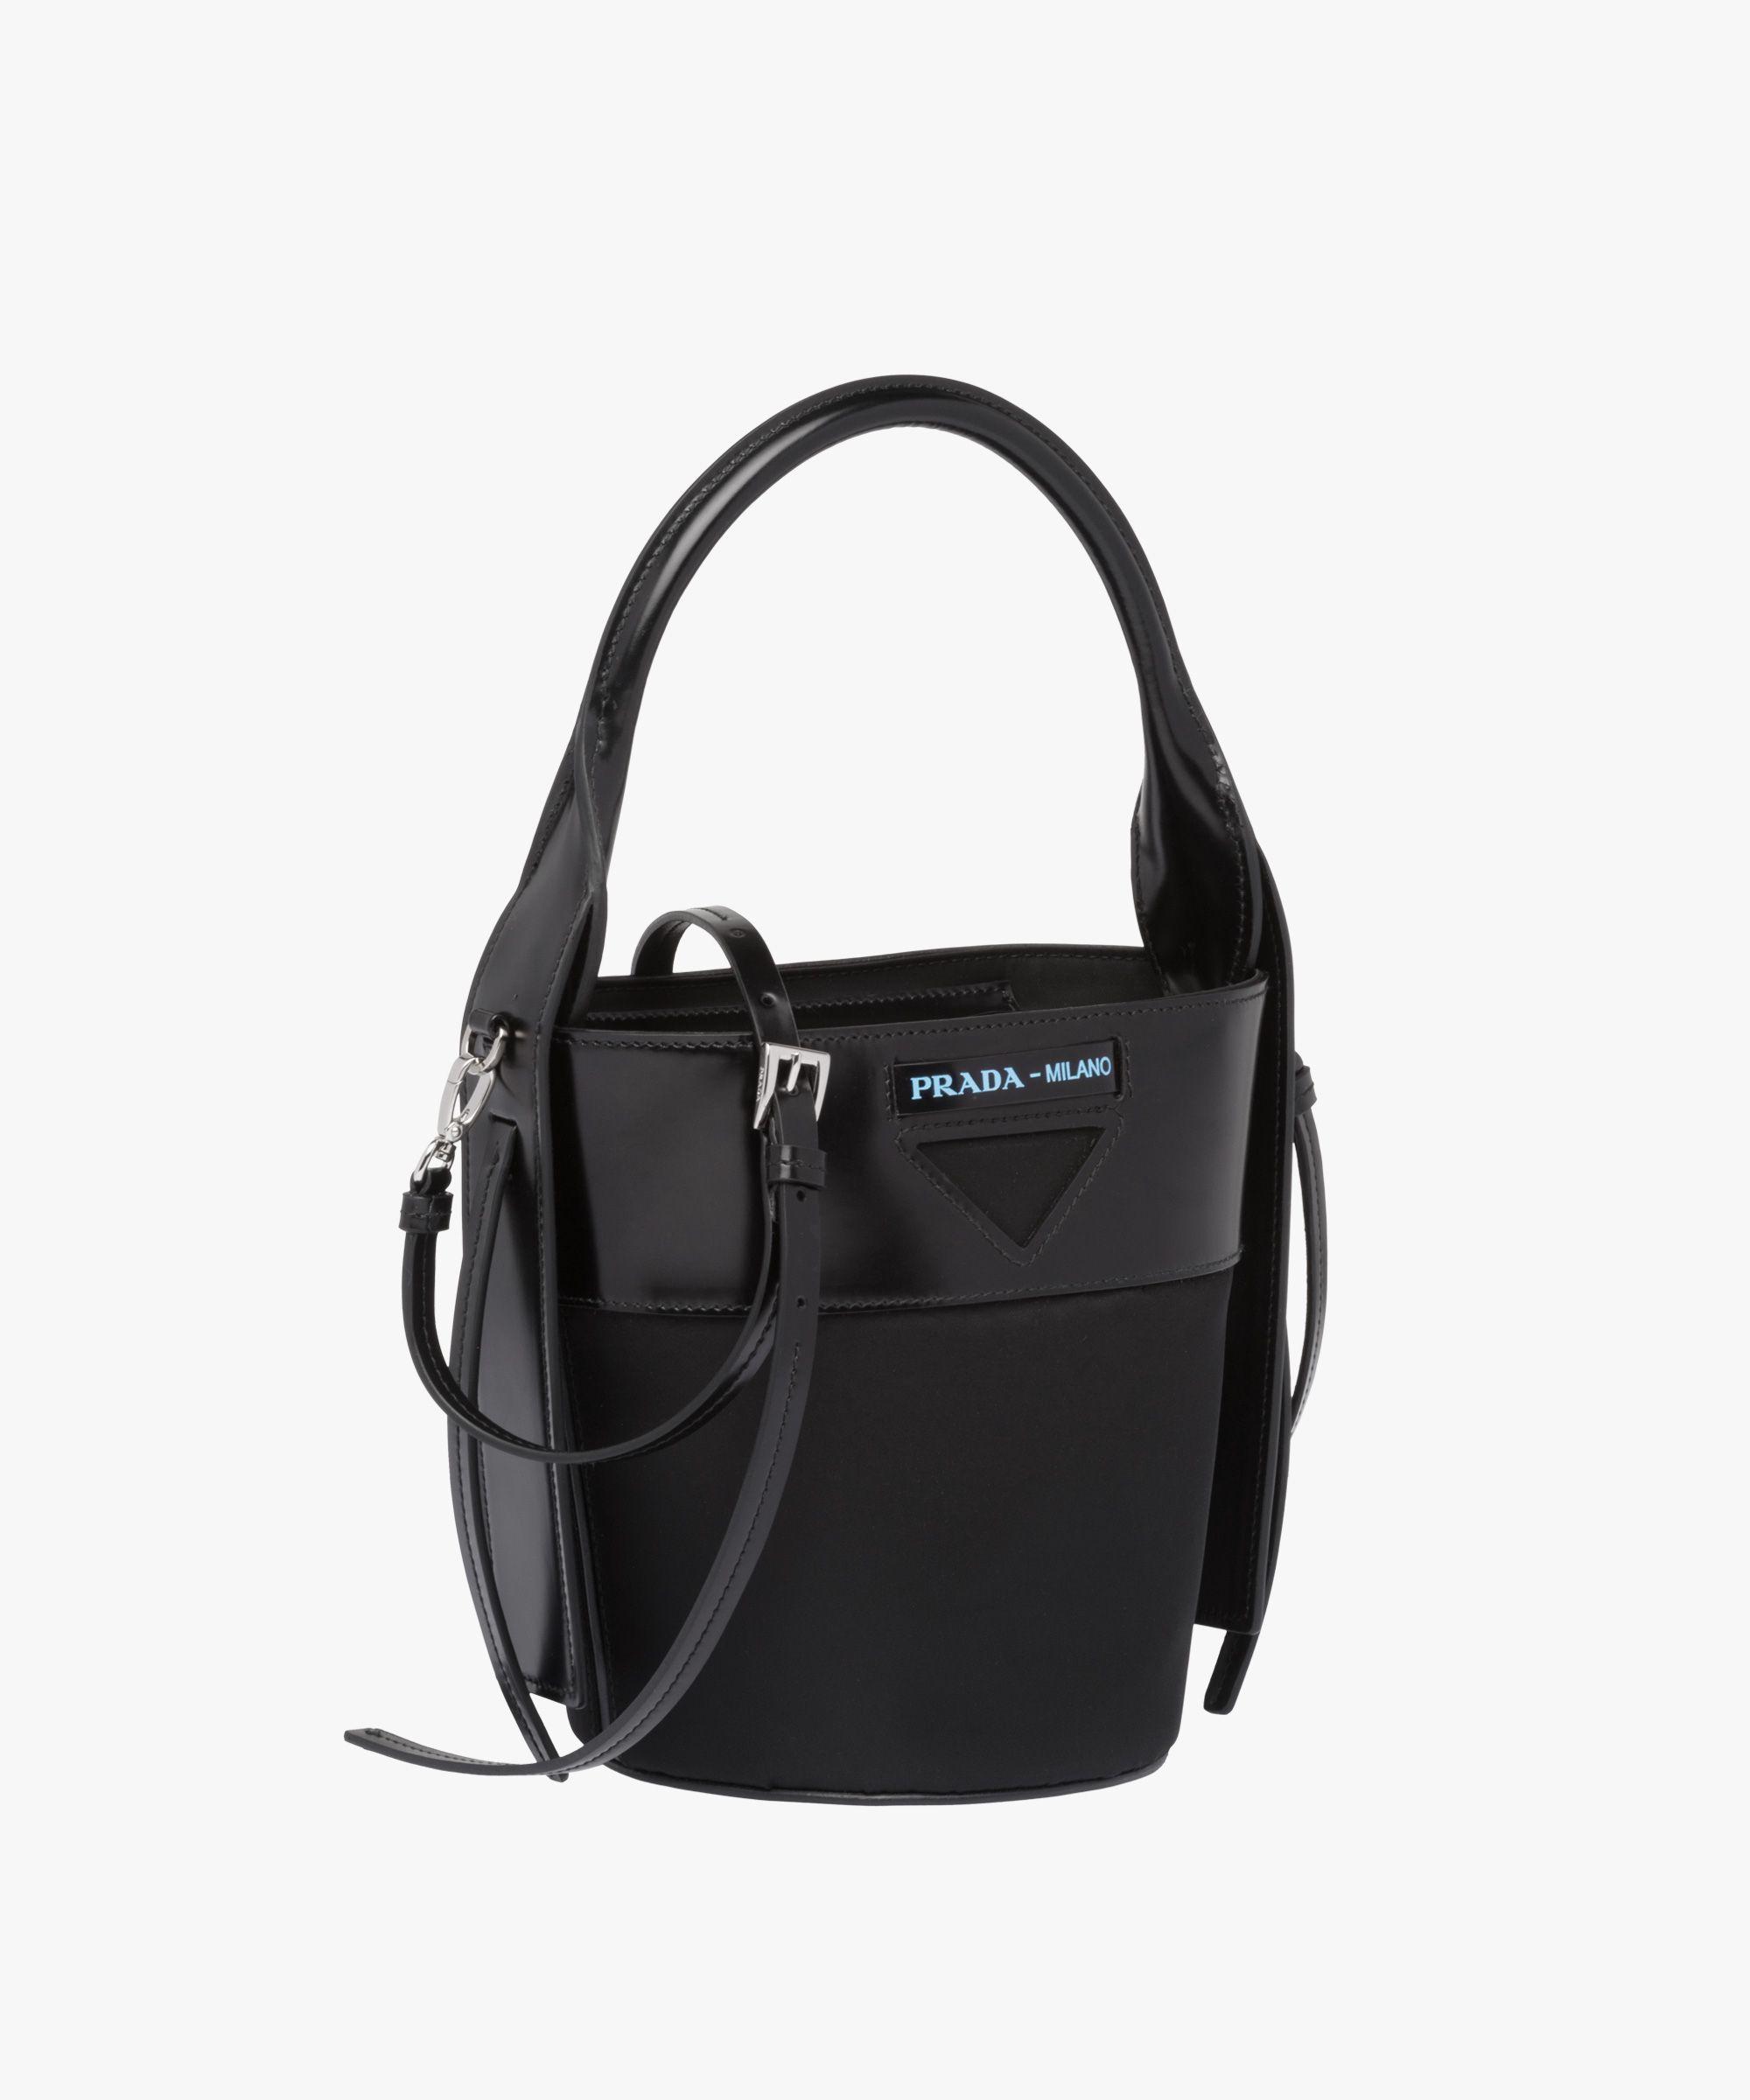 c31b41b8f6 Prada - Ouverture black nylon bucket bag | BAGS in 2019 | Bags, Mens ...